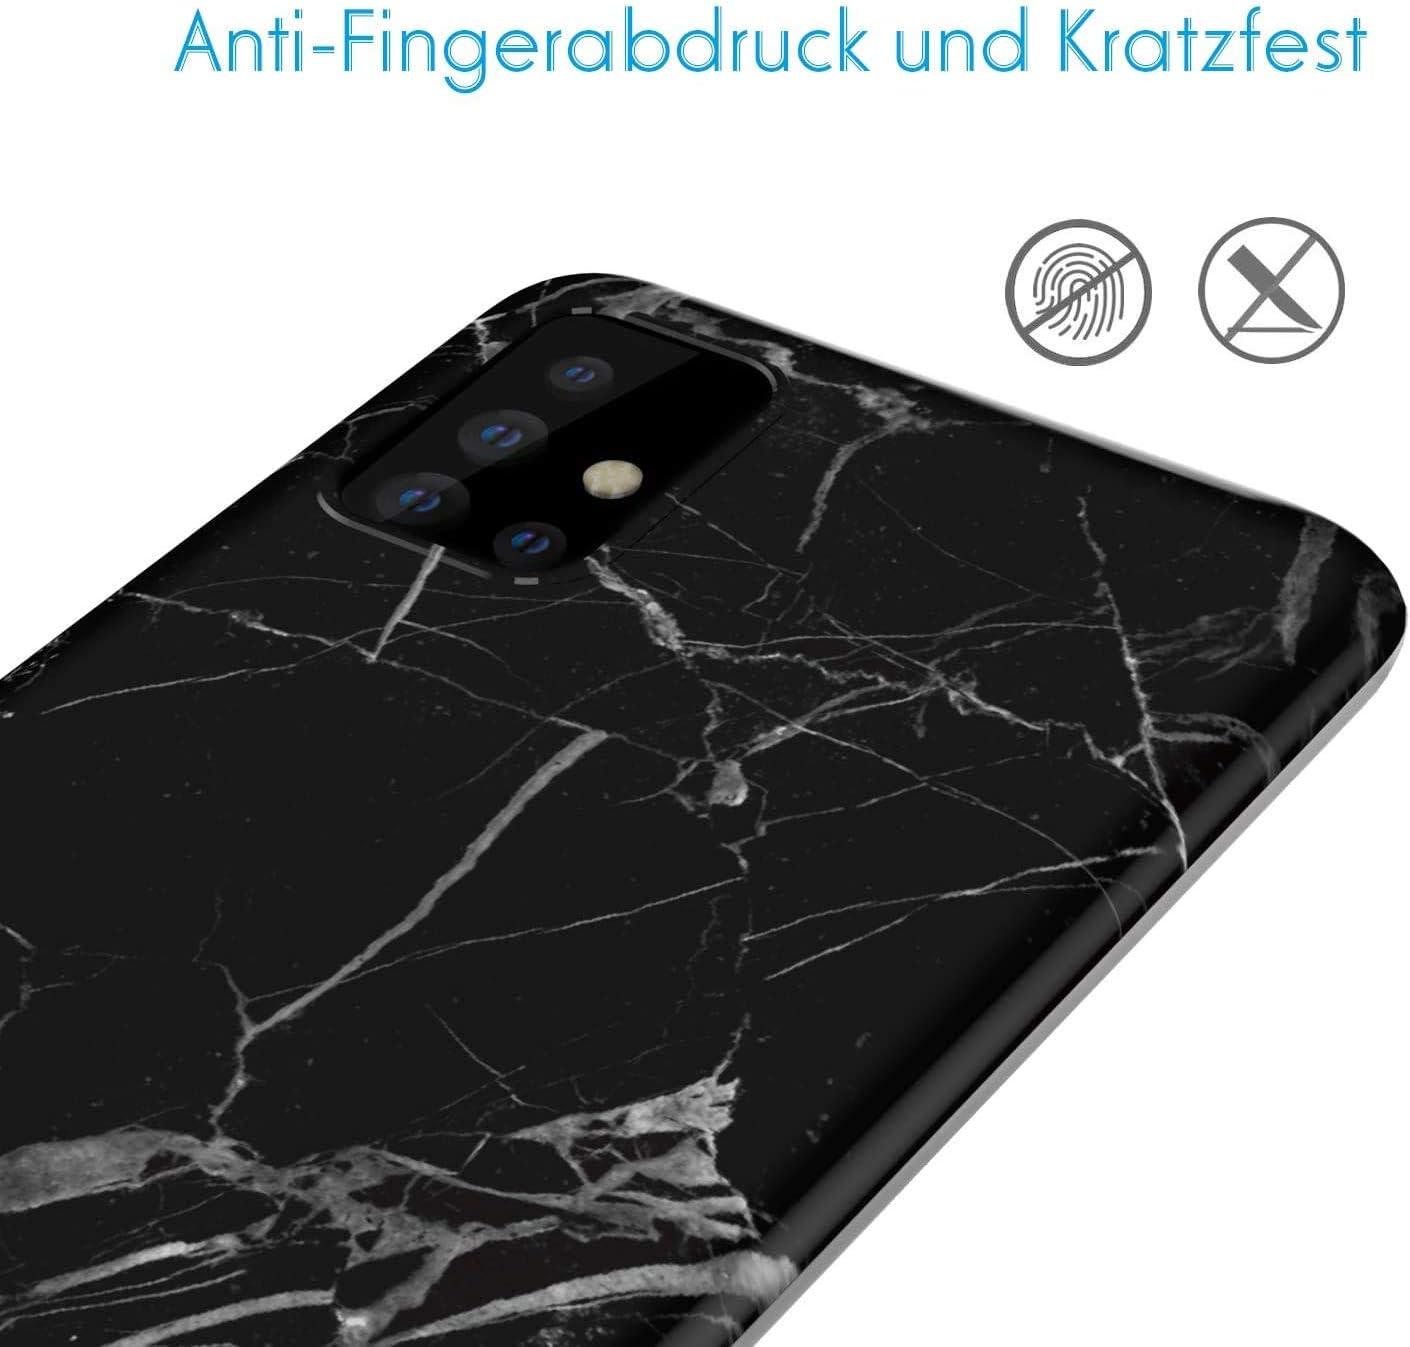 con motivo marmo opaco VoguSaNa Custodia morbida in TPU per Samsung Galaxy A71